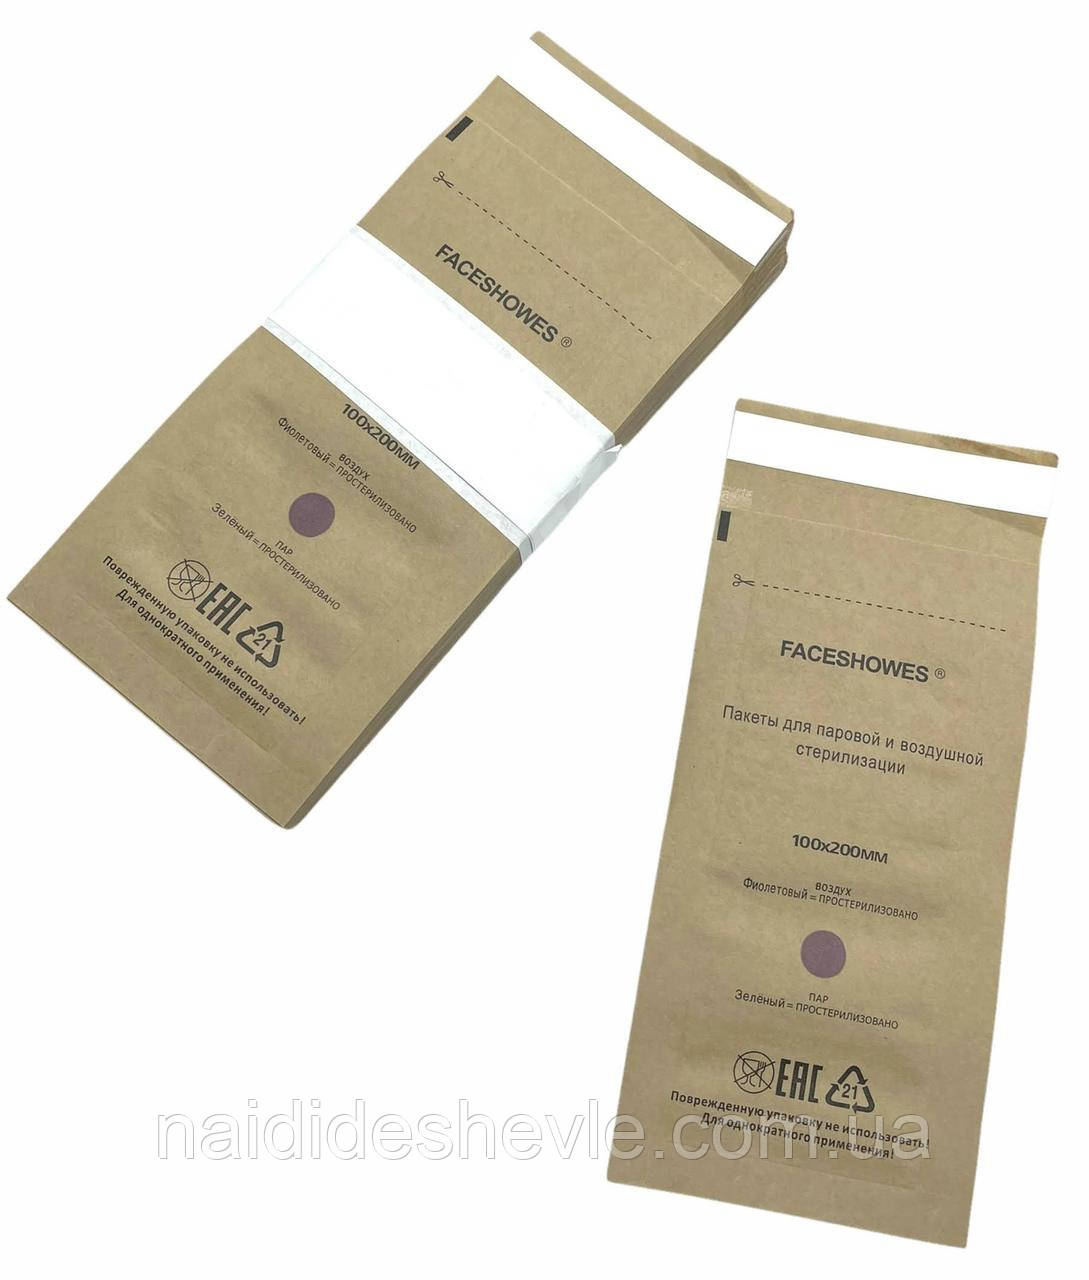 Крафт пакеты для стерилизации, 100х200 мм.